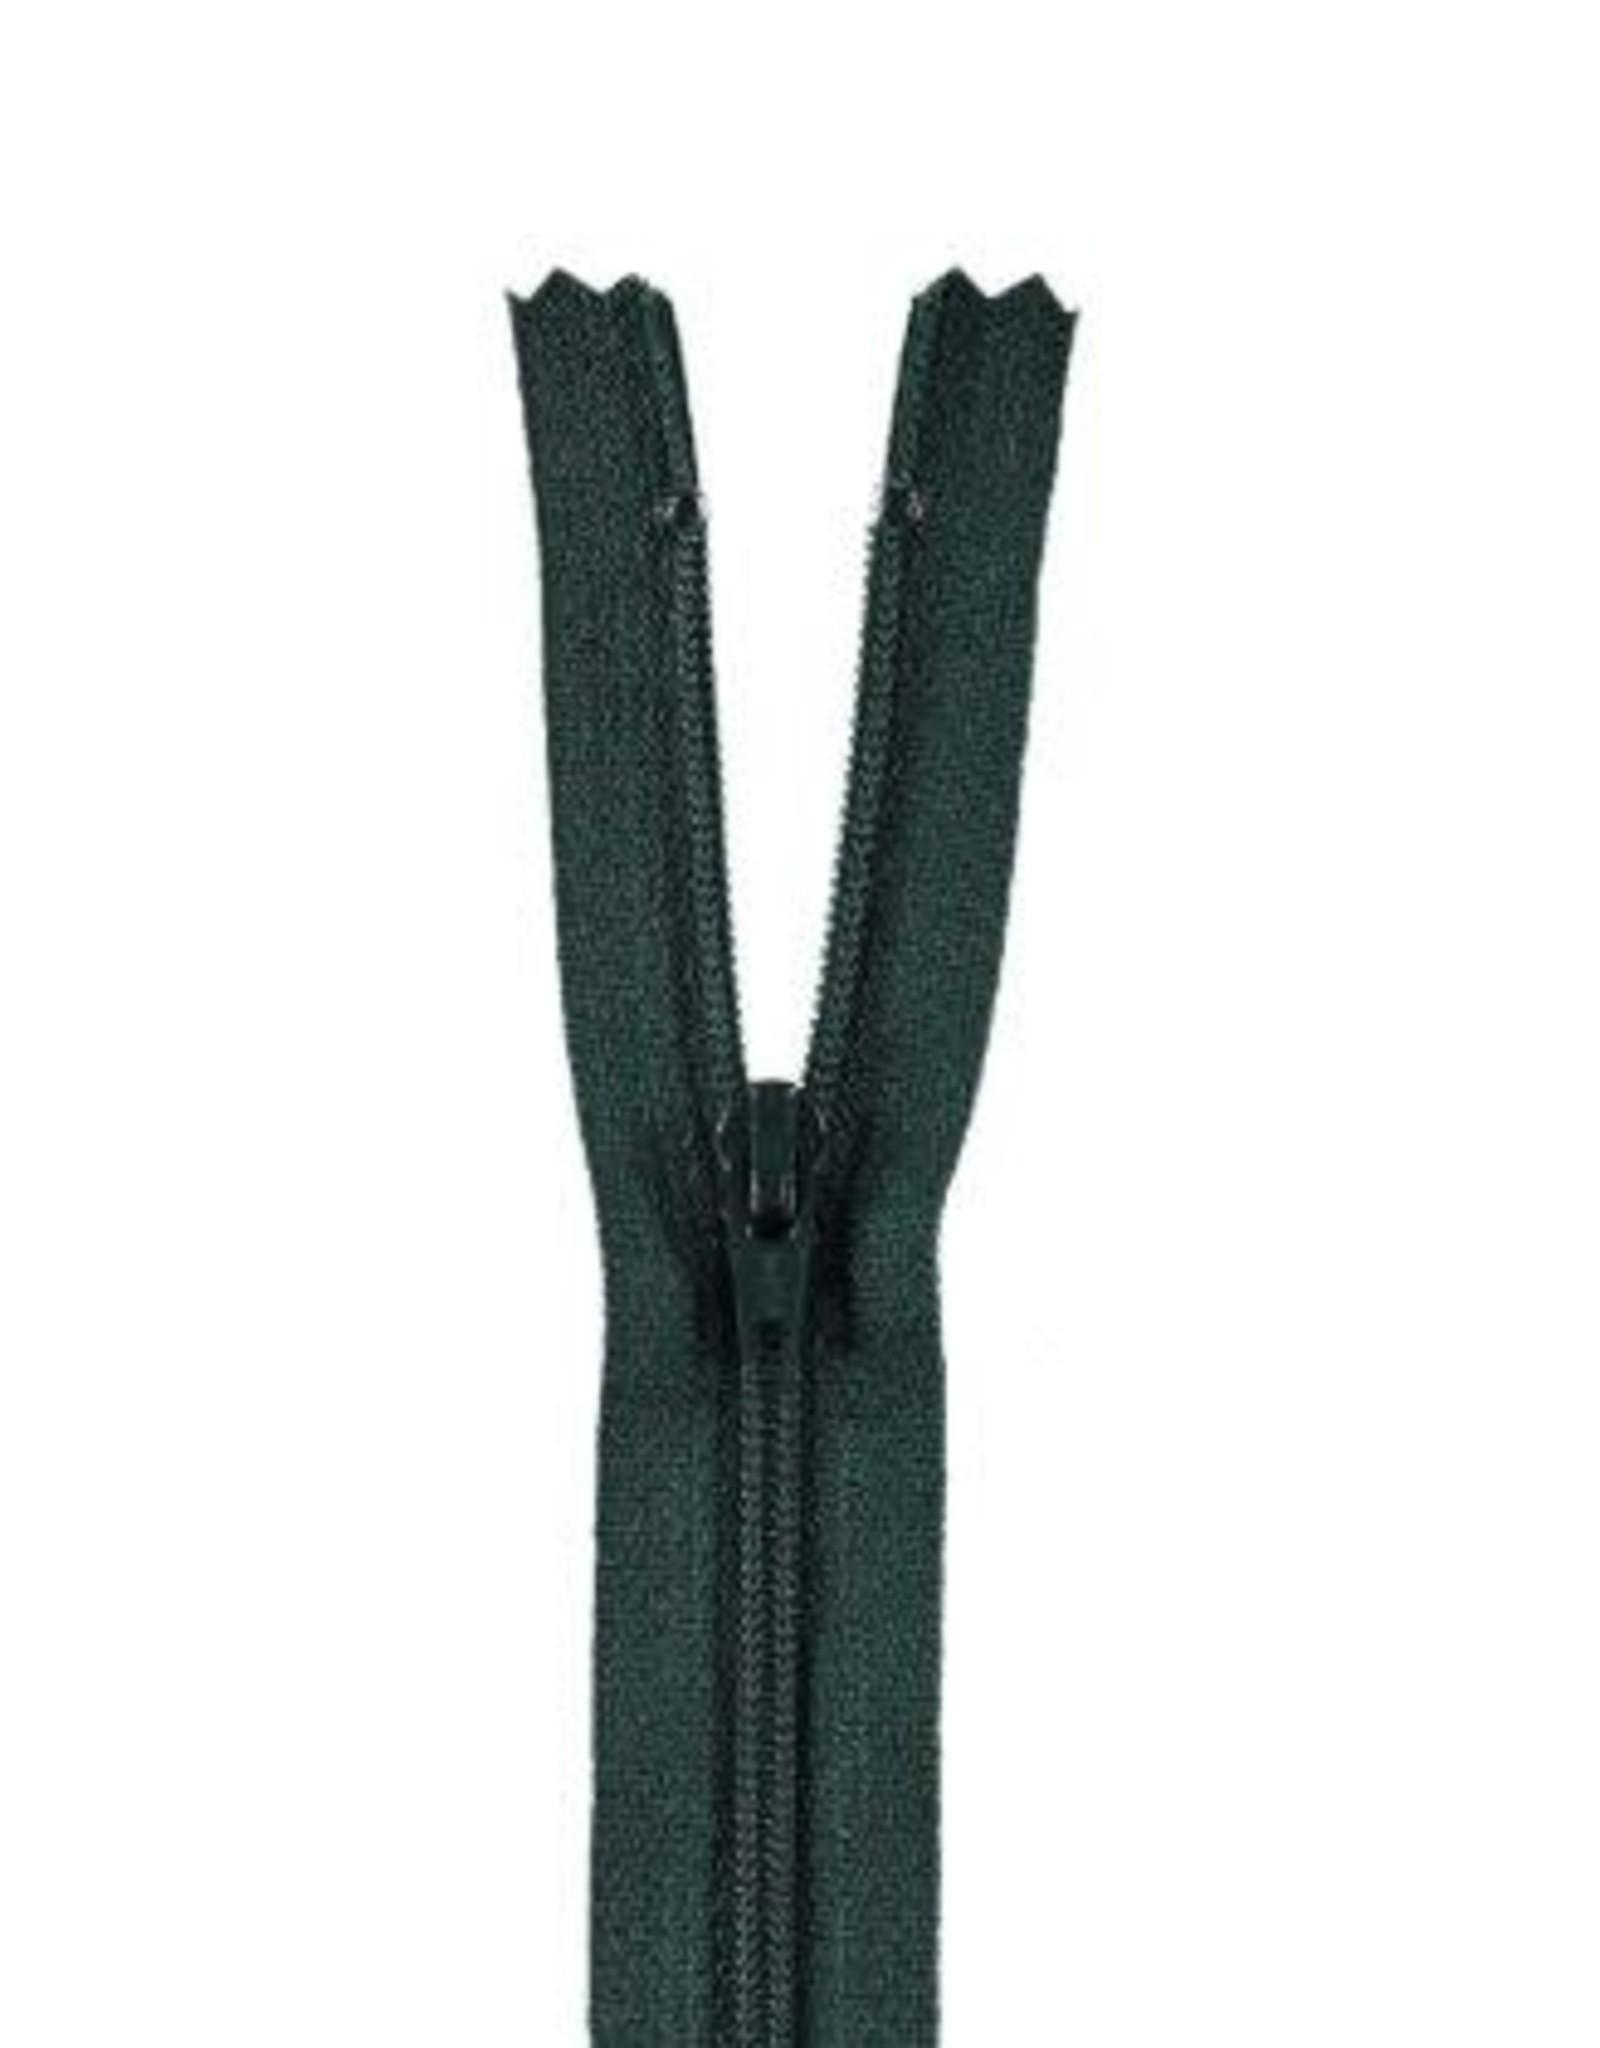 YKK Spiraalrits niet-DB 3mm donker groen 890-25cm